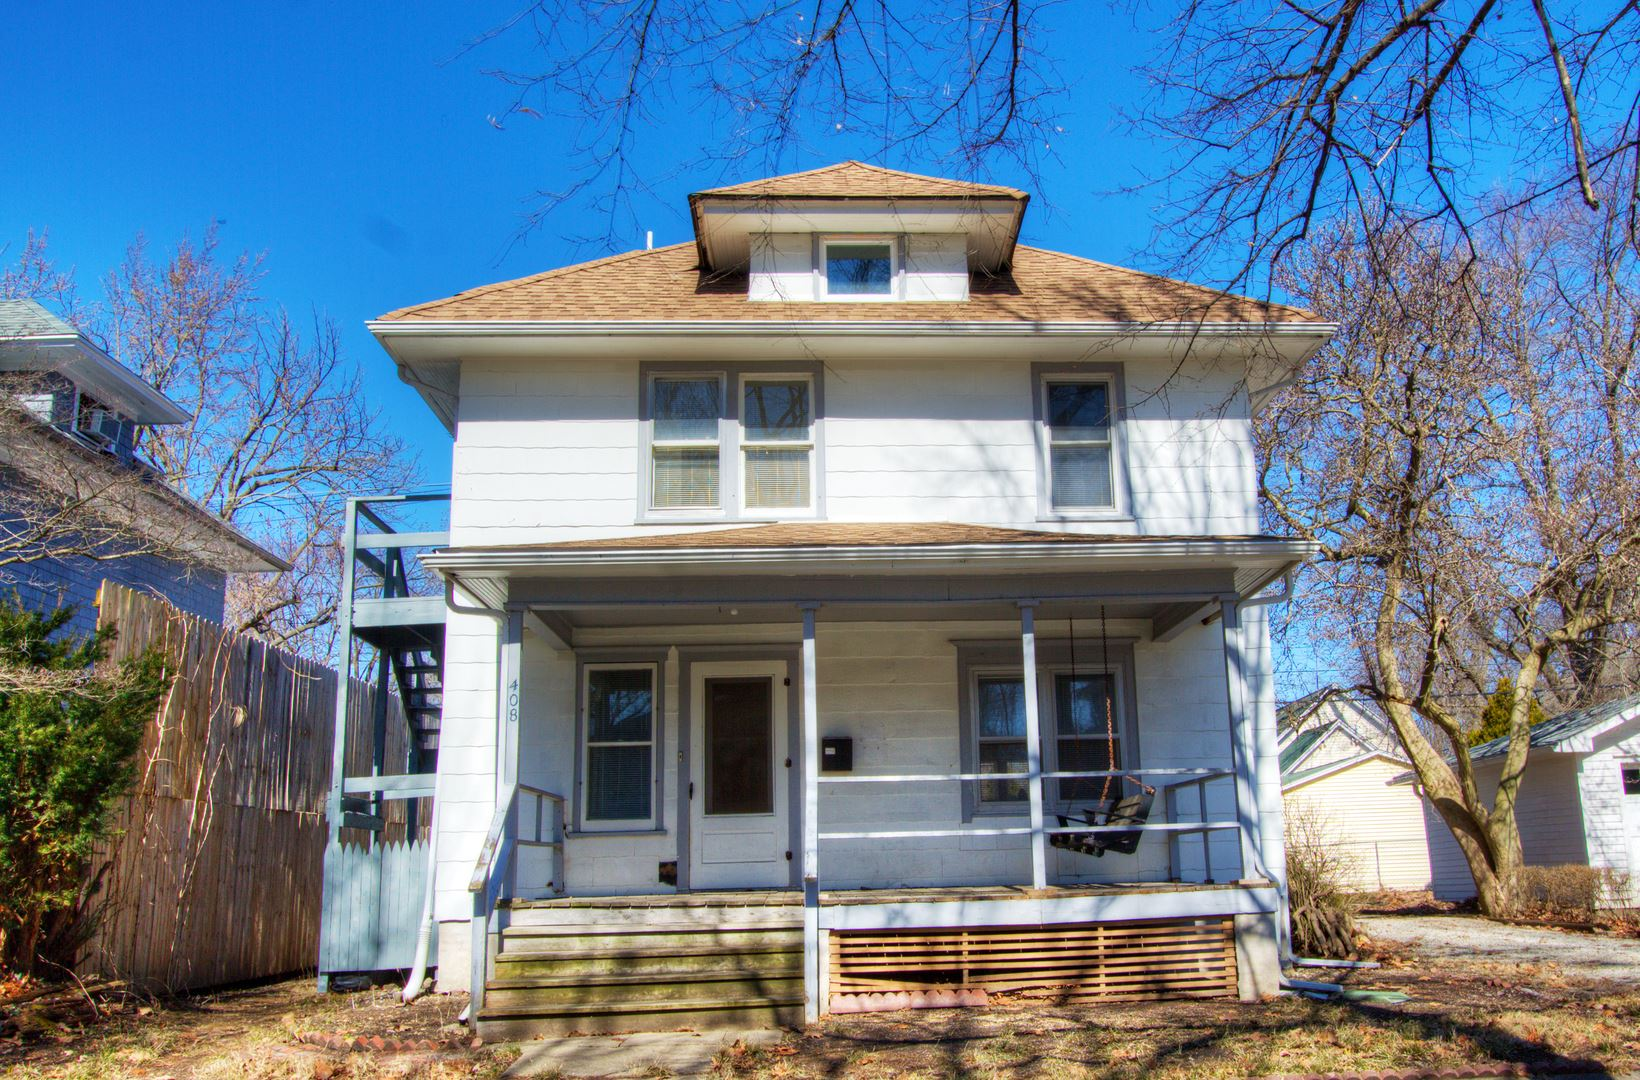 408 W Illinois Street, Urbana, IL 61801 - #: 10627733